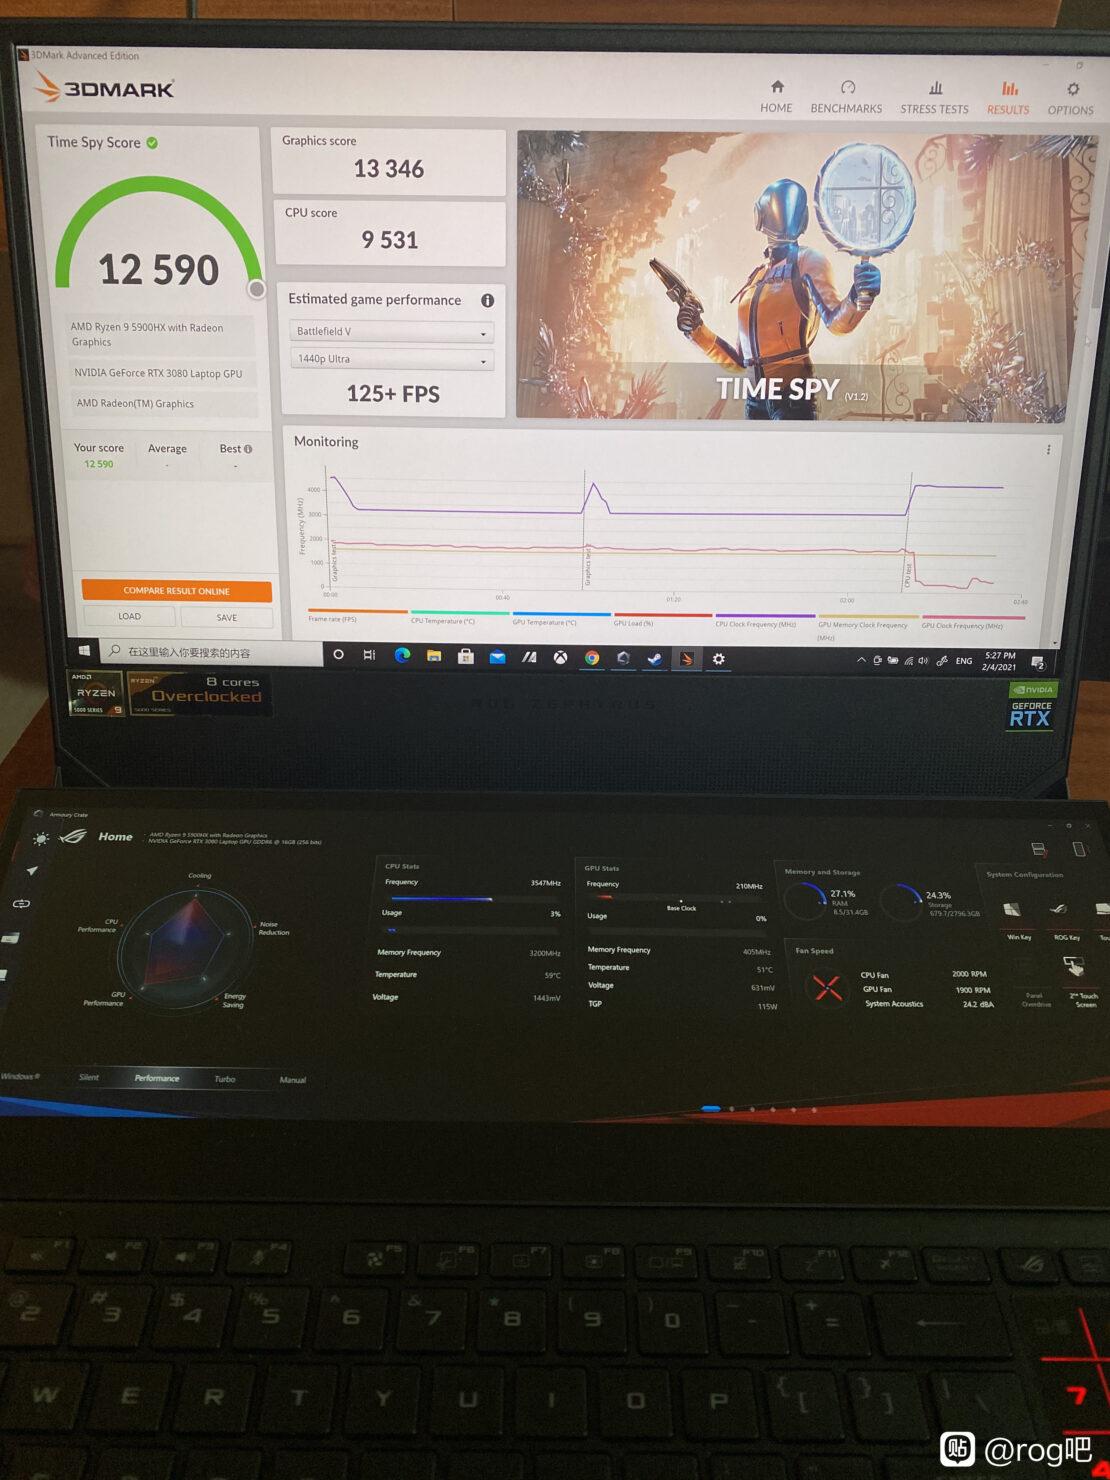 vbios-swap-allows-geforce-rtx-3080-on-asus-rog-zephyrus-duo-15-se-to-run-at-a-higher-tgp-beats-desktop-rtx-3060-ti-2